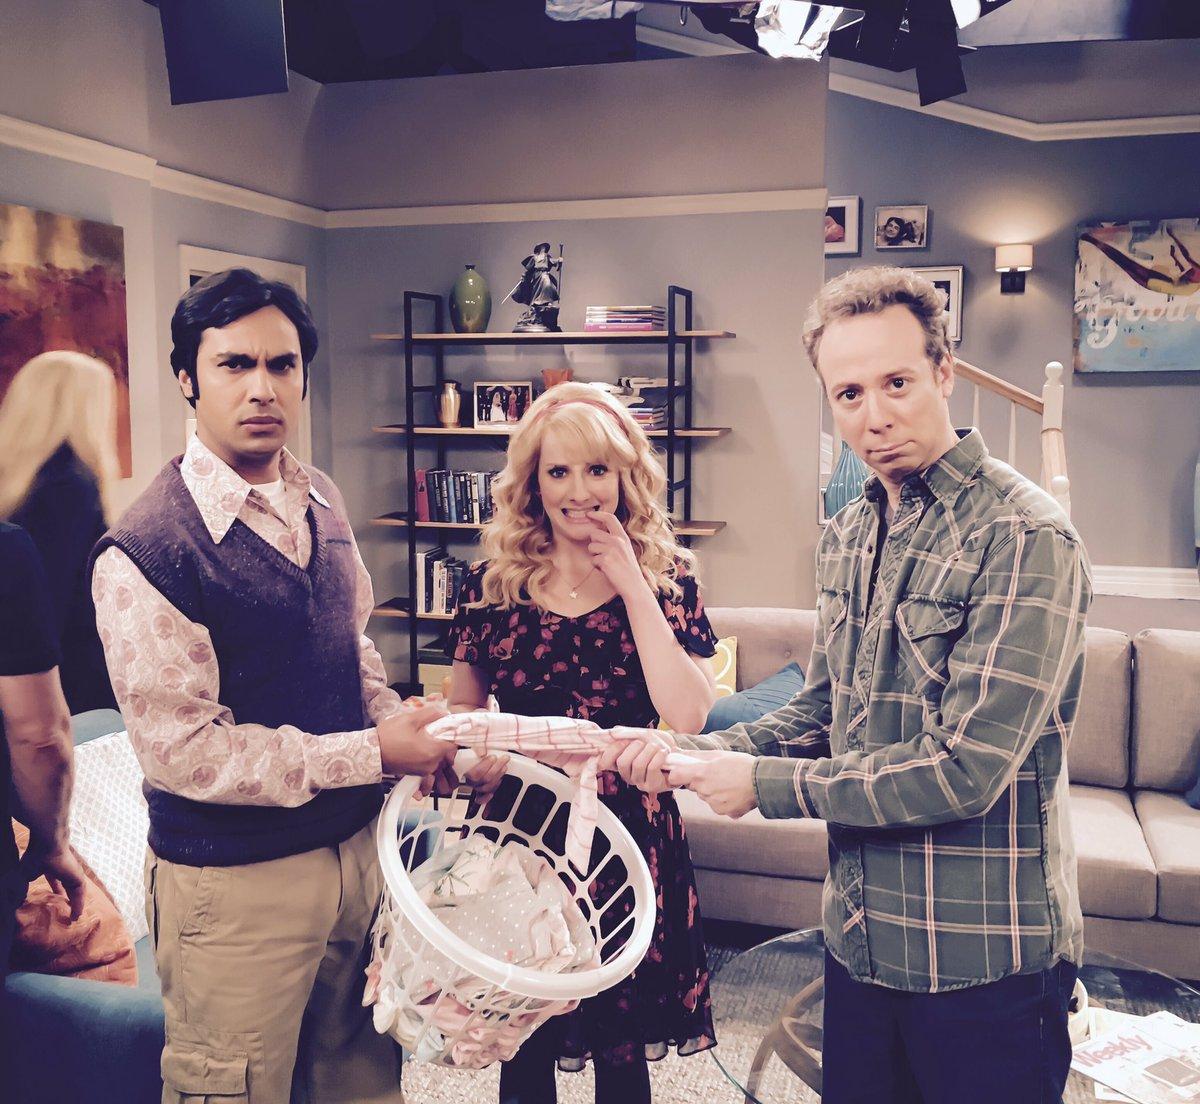 On tonight's @bigbangtheory episode...adventures in babysitting with these guys @kunalnayyar & @KevinSussman https://t.co/XOqOzBjOP3